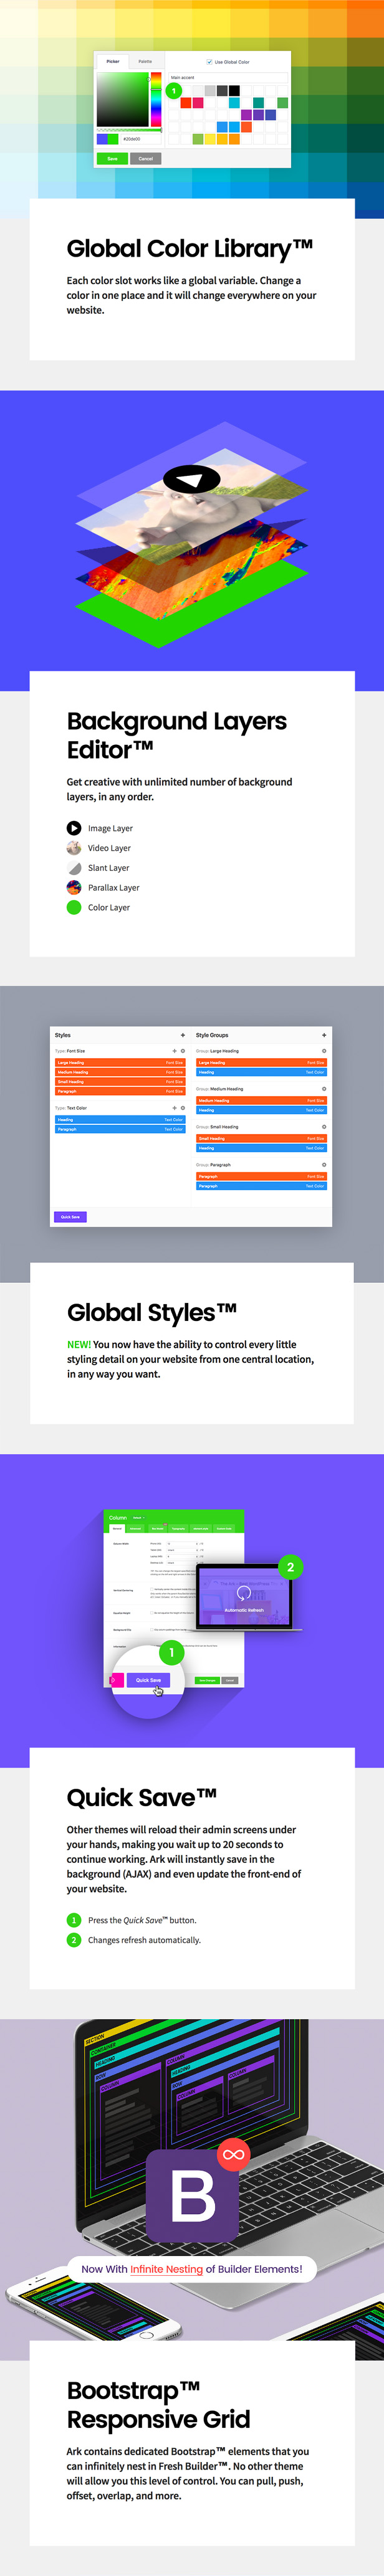 the ark8 - The Ark | WordPress Theme made for Freelancers